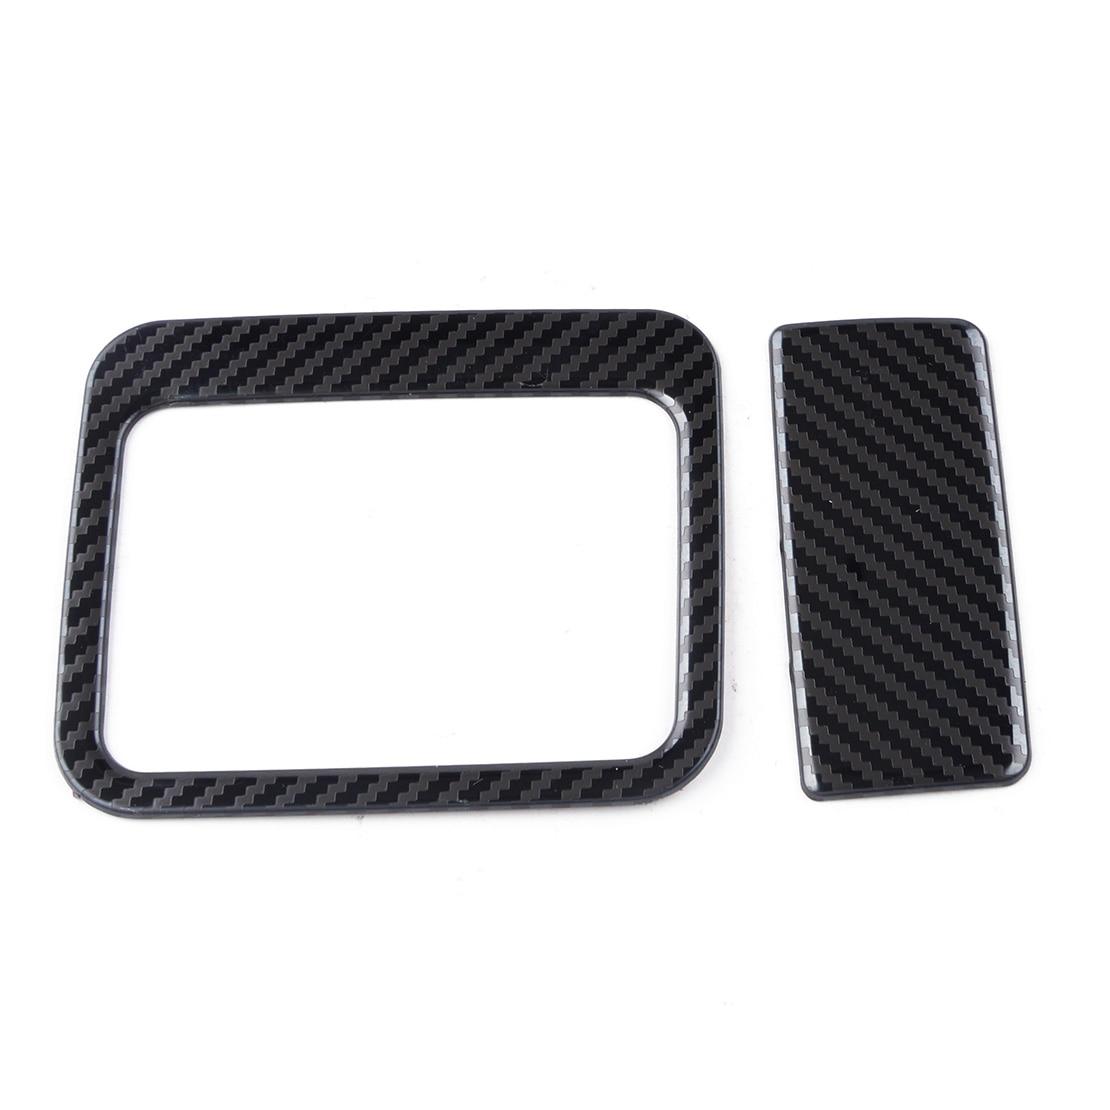 Car Carbon Fiber Black Style Co-pilot Glove Storage Box Handle Cover Trim Fit for Toyota Rav4 2019 2020